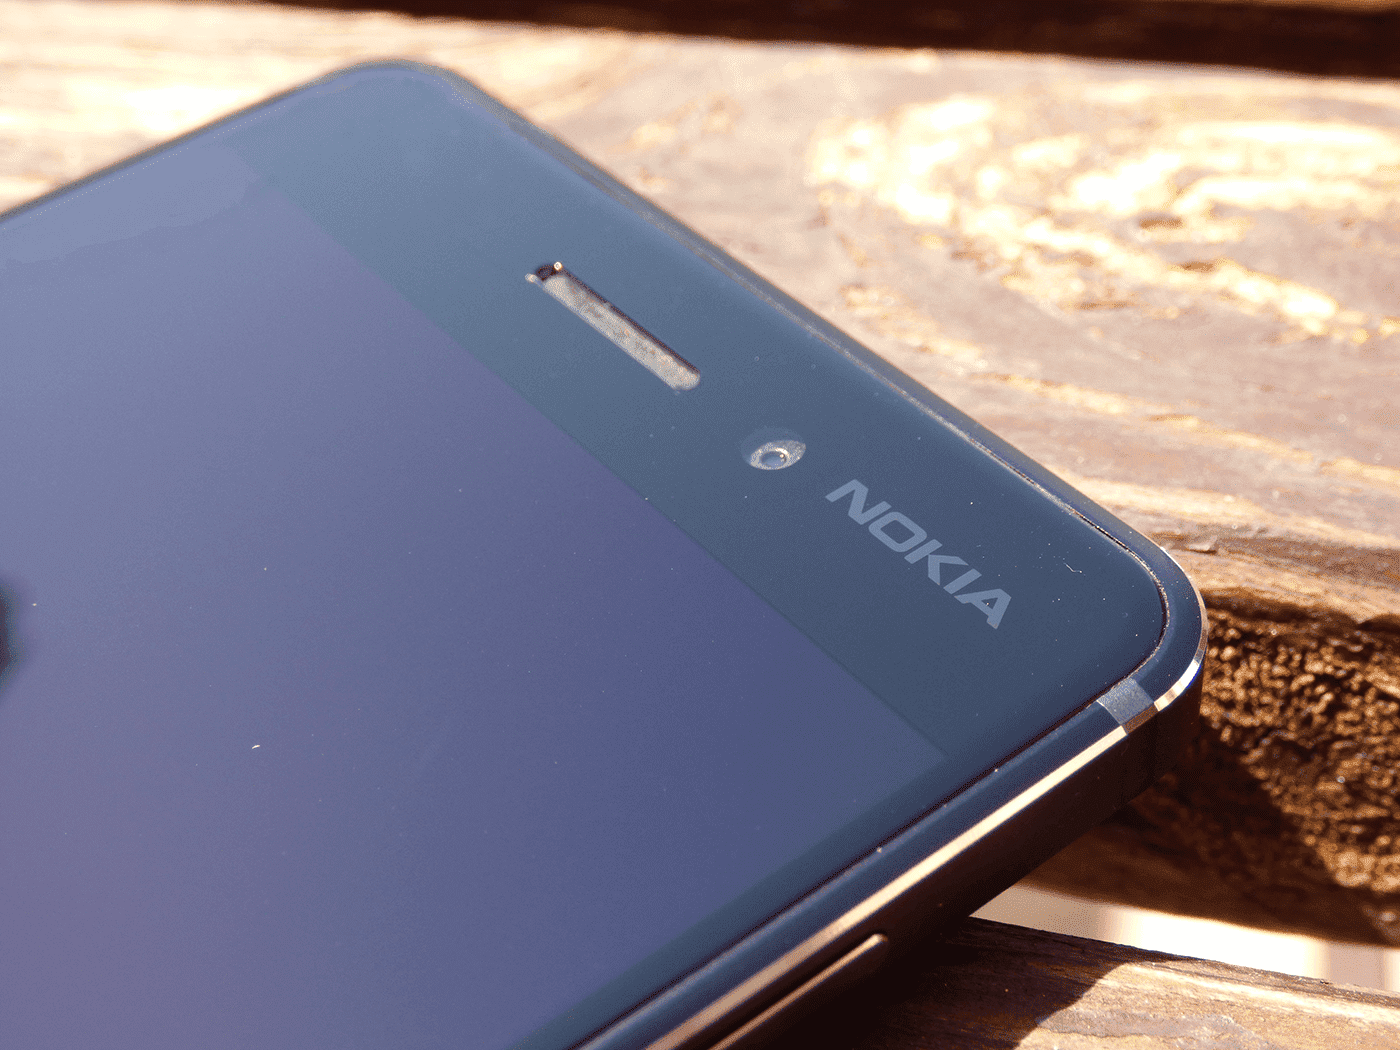 Detalle superior del Nokia 6